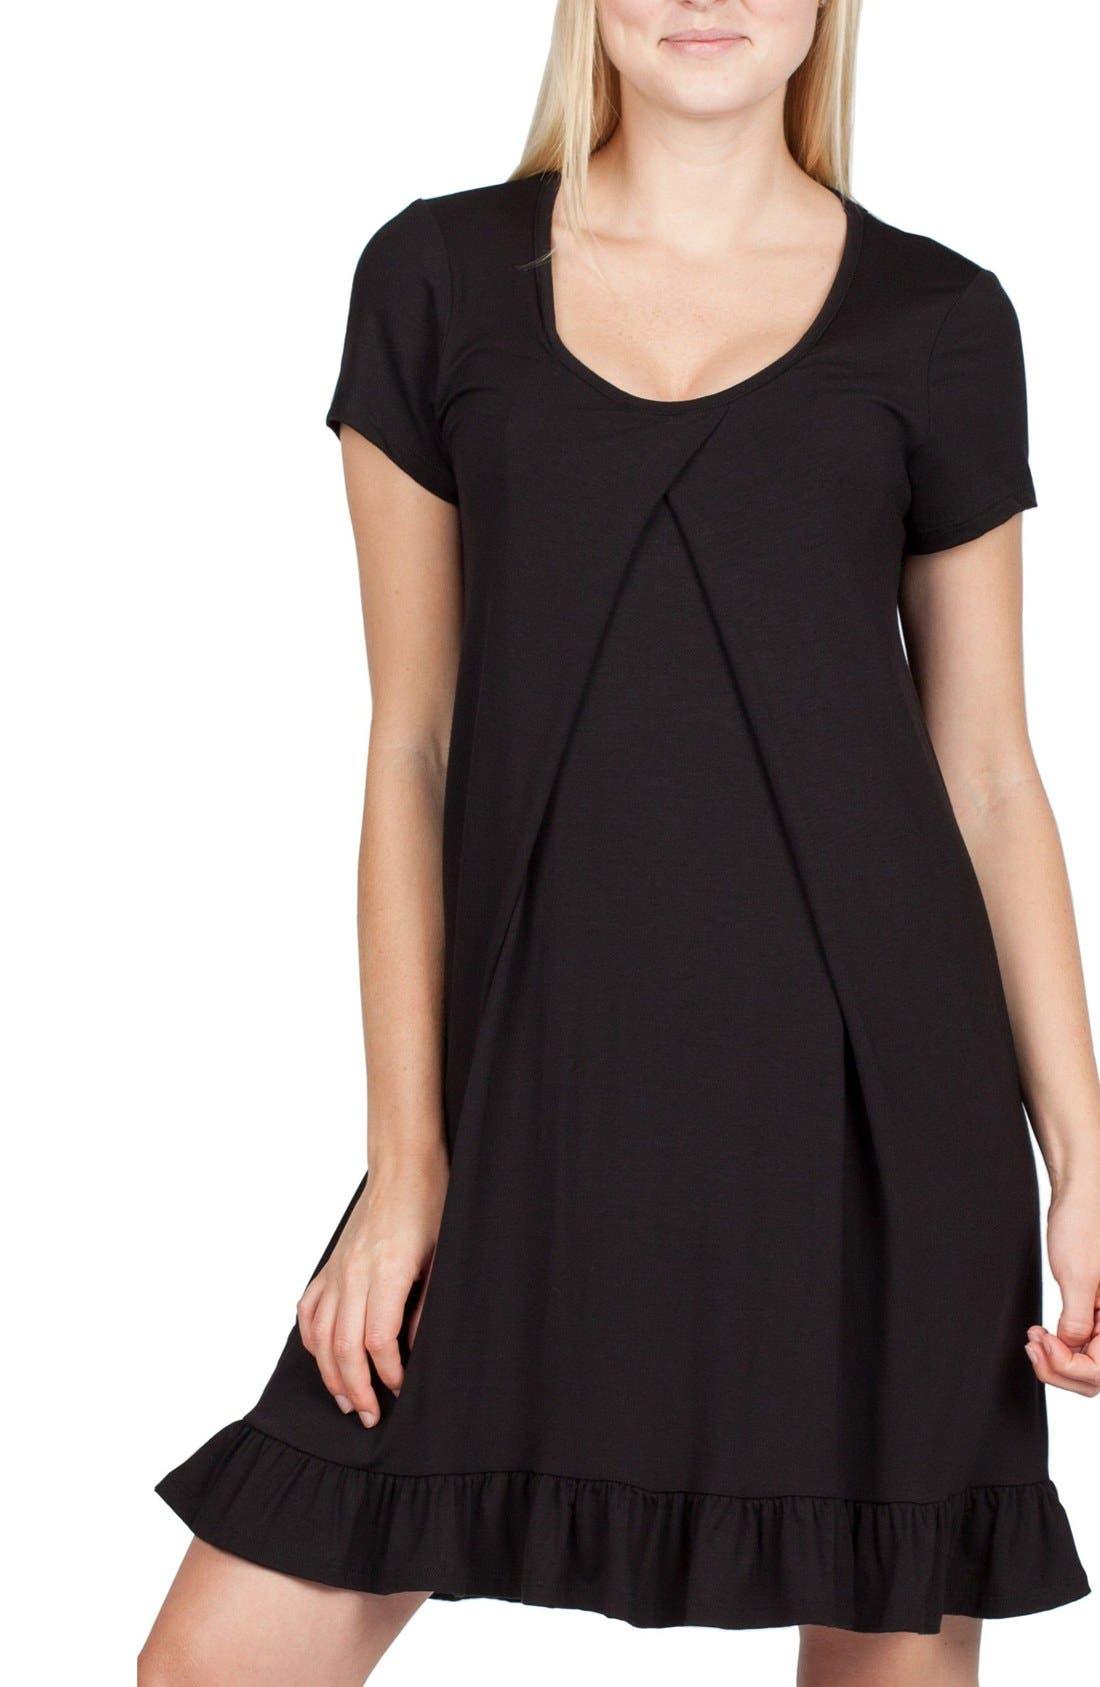 San Francisco Maternity/Nursing Nightgown,                         Main,                         color, BLACK